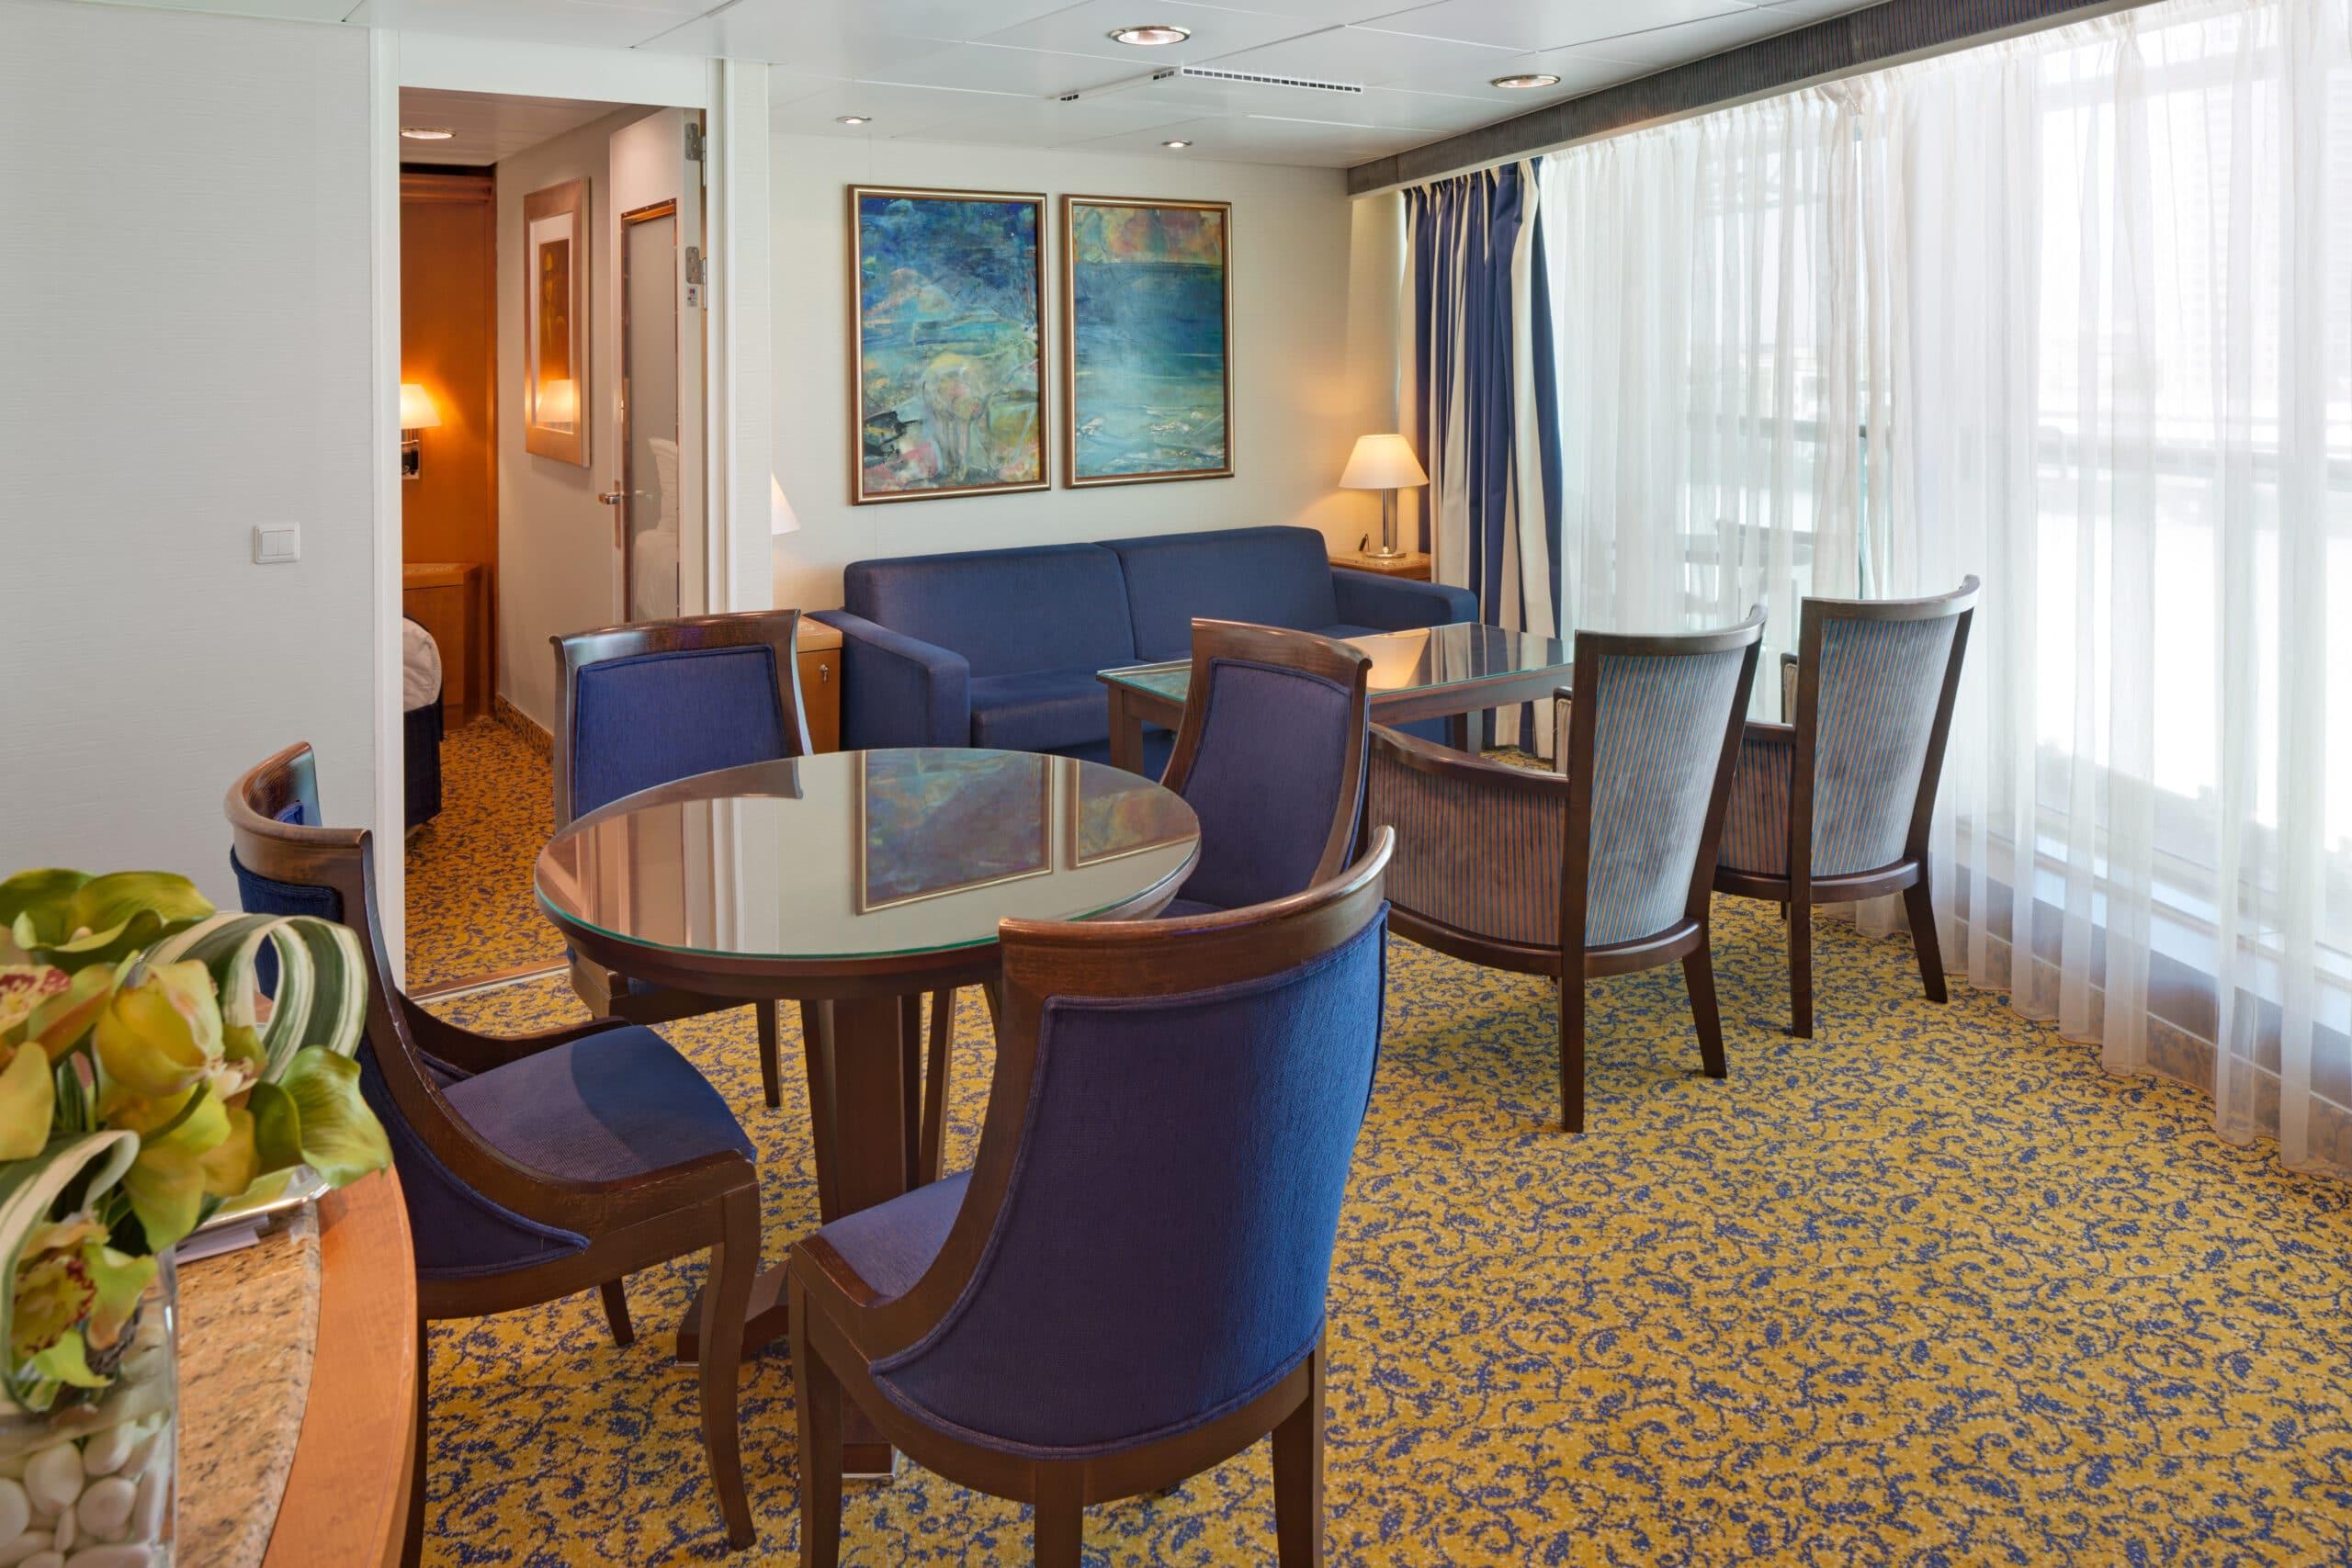 Royal-Caribbean-International-Brilliance-of-the-Seas-schip-cruiseschip-categorie-GT-Grand-Suite-two-bedroom